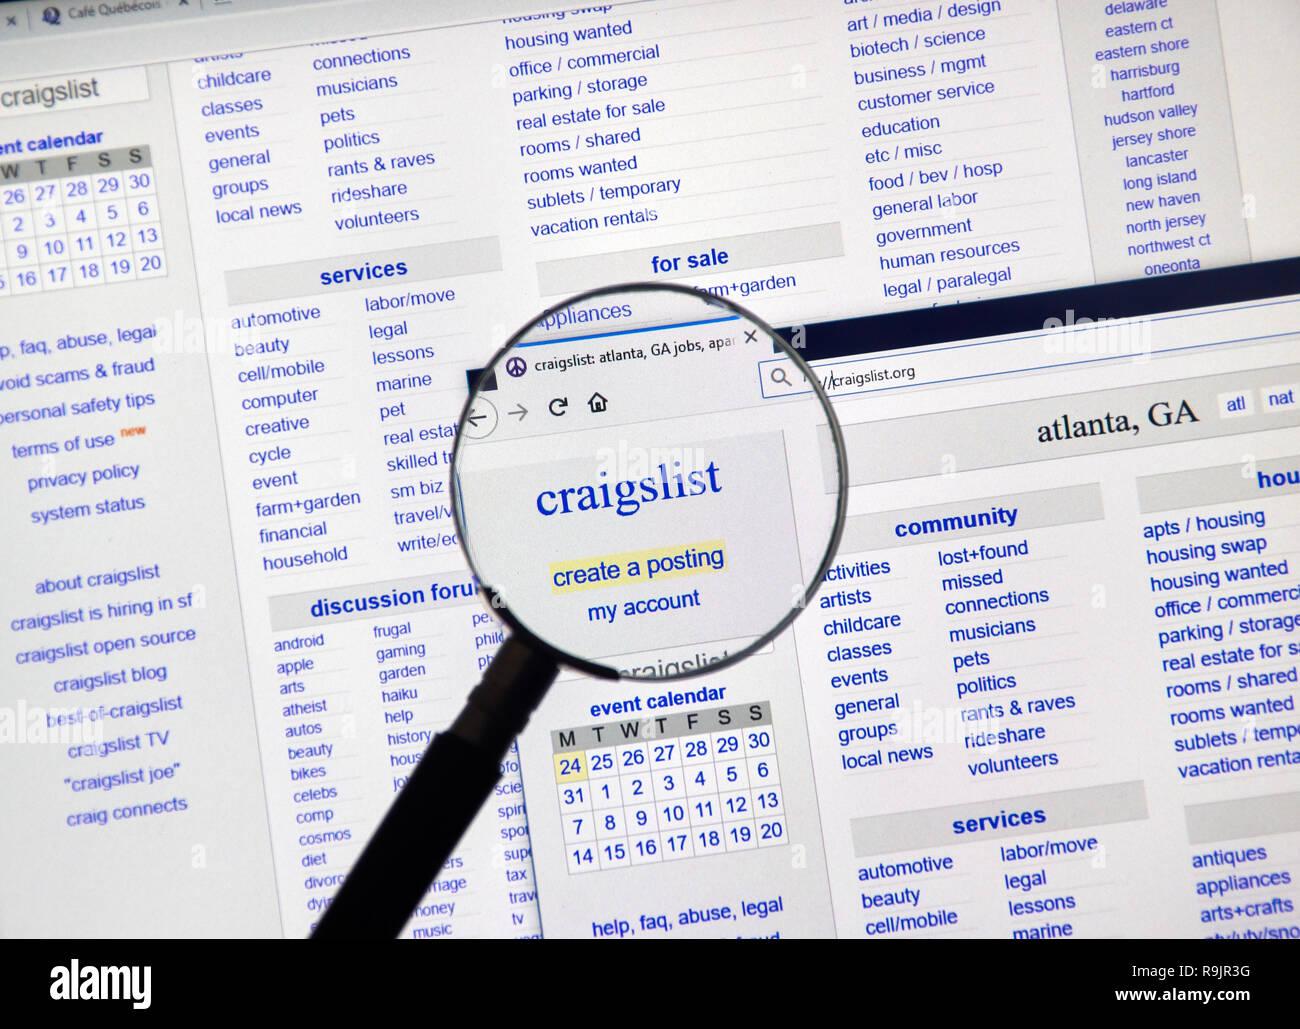 Craigslist Logo Stock Photos & Craigslist Logo Stock Images